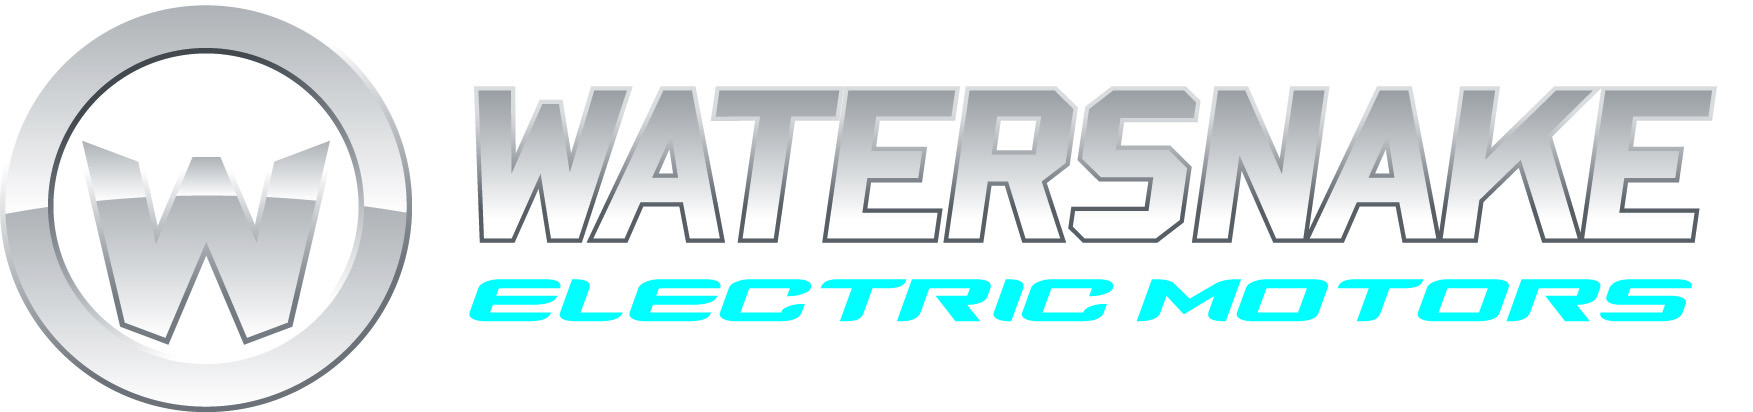 Watersnake - motori elettrici